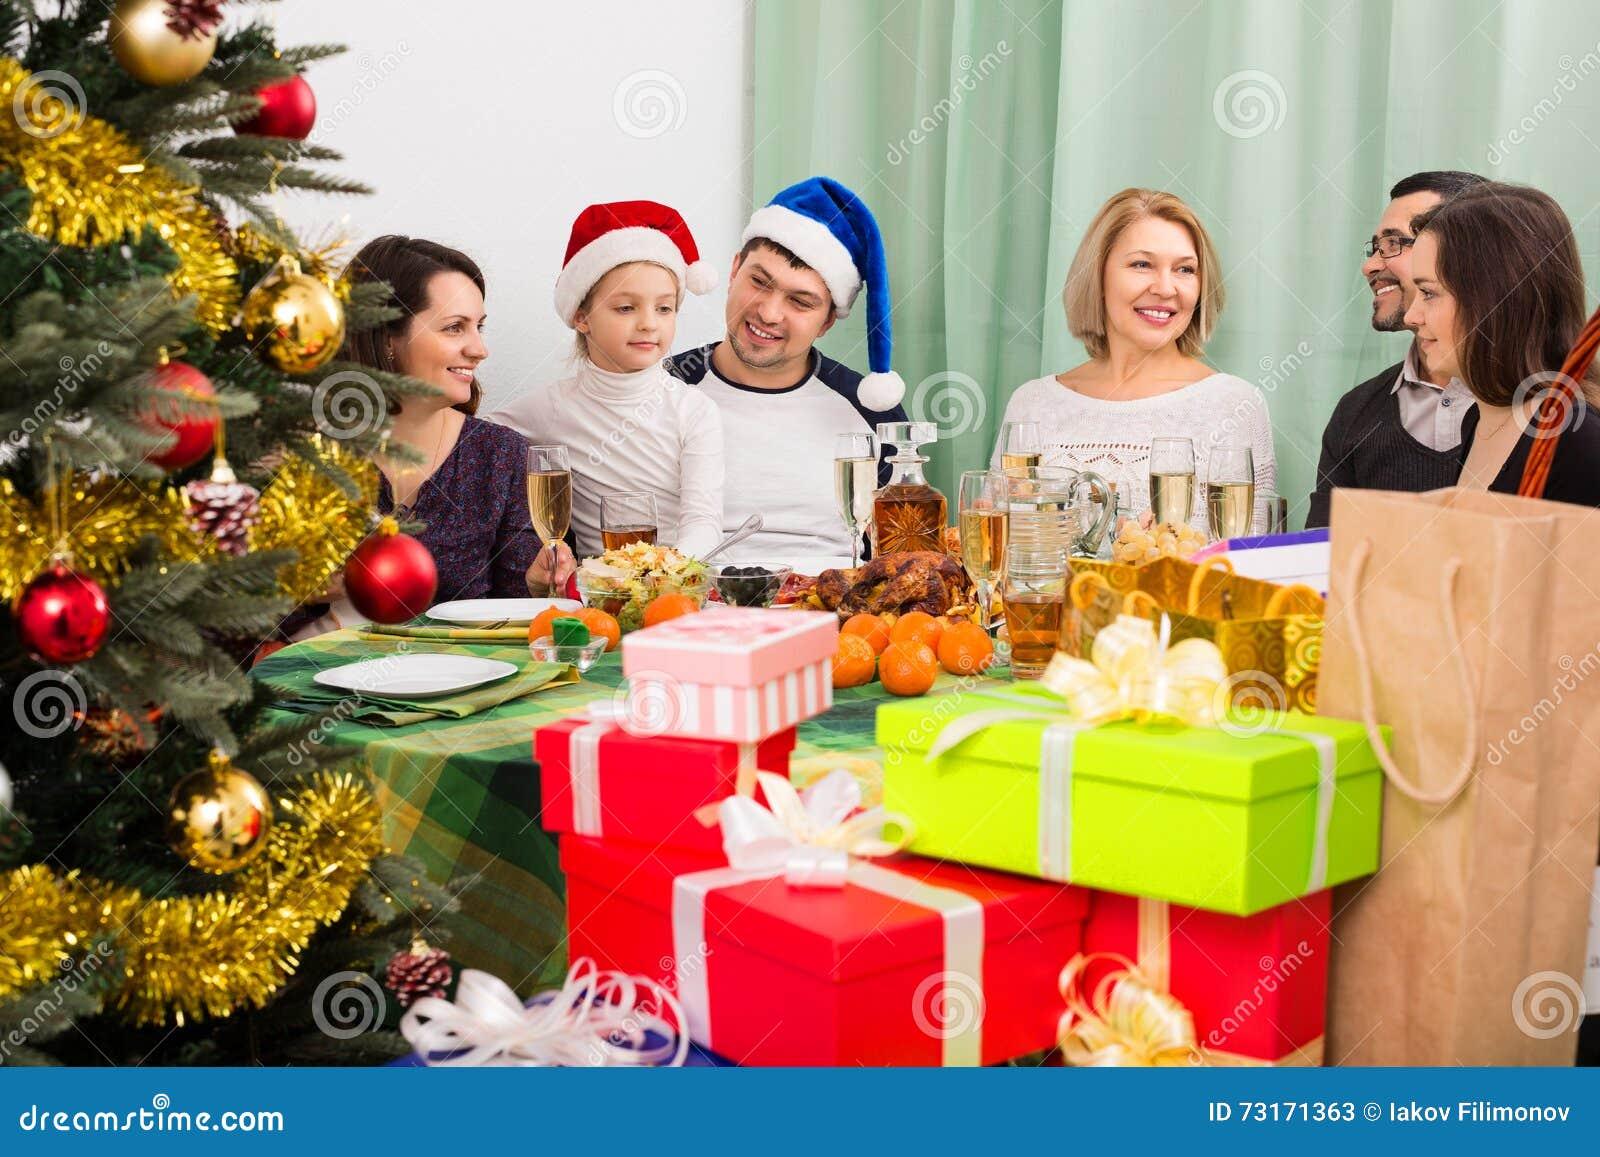 Family Gathering Together For Christmas Celebration Stock